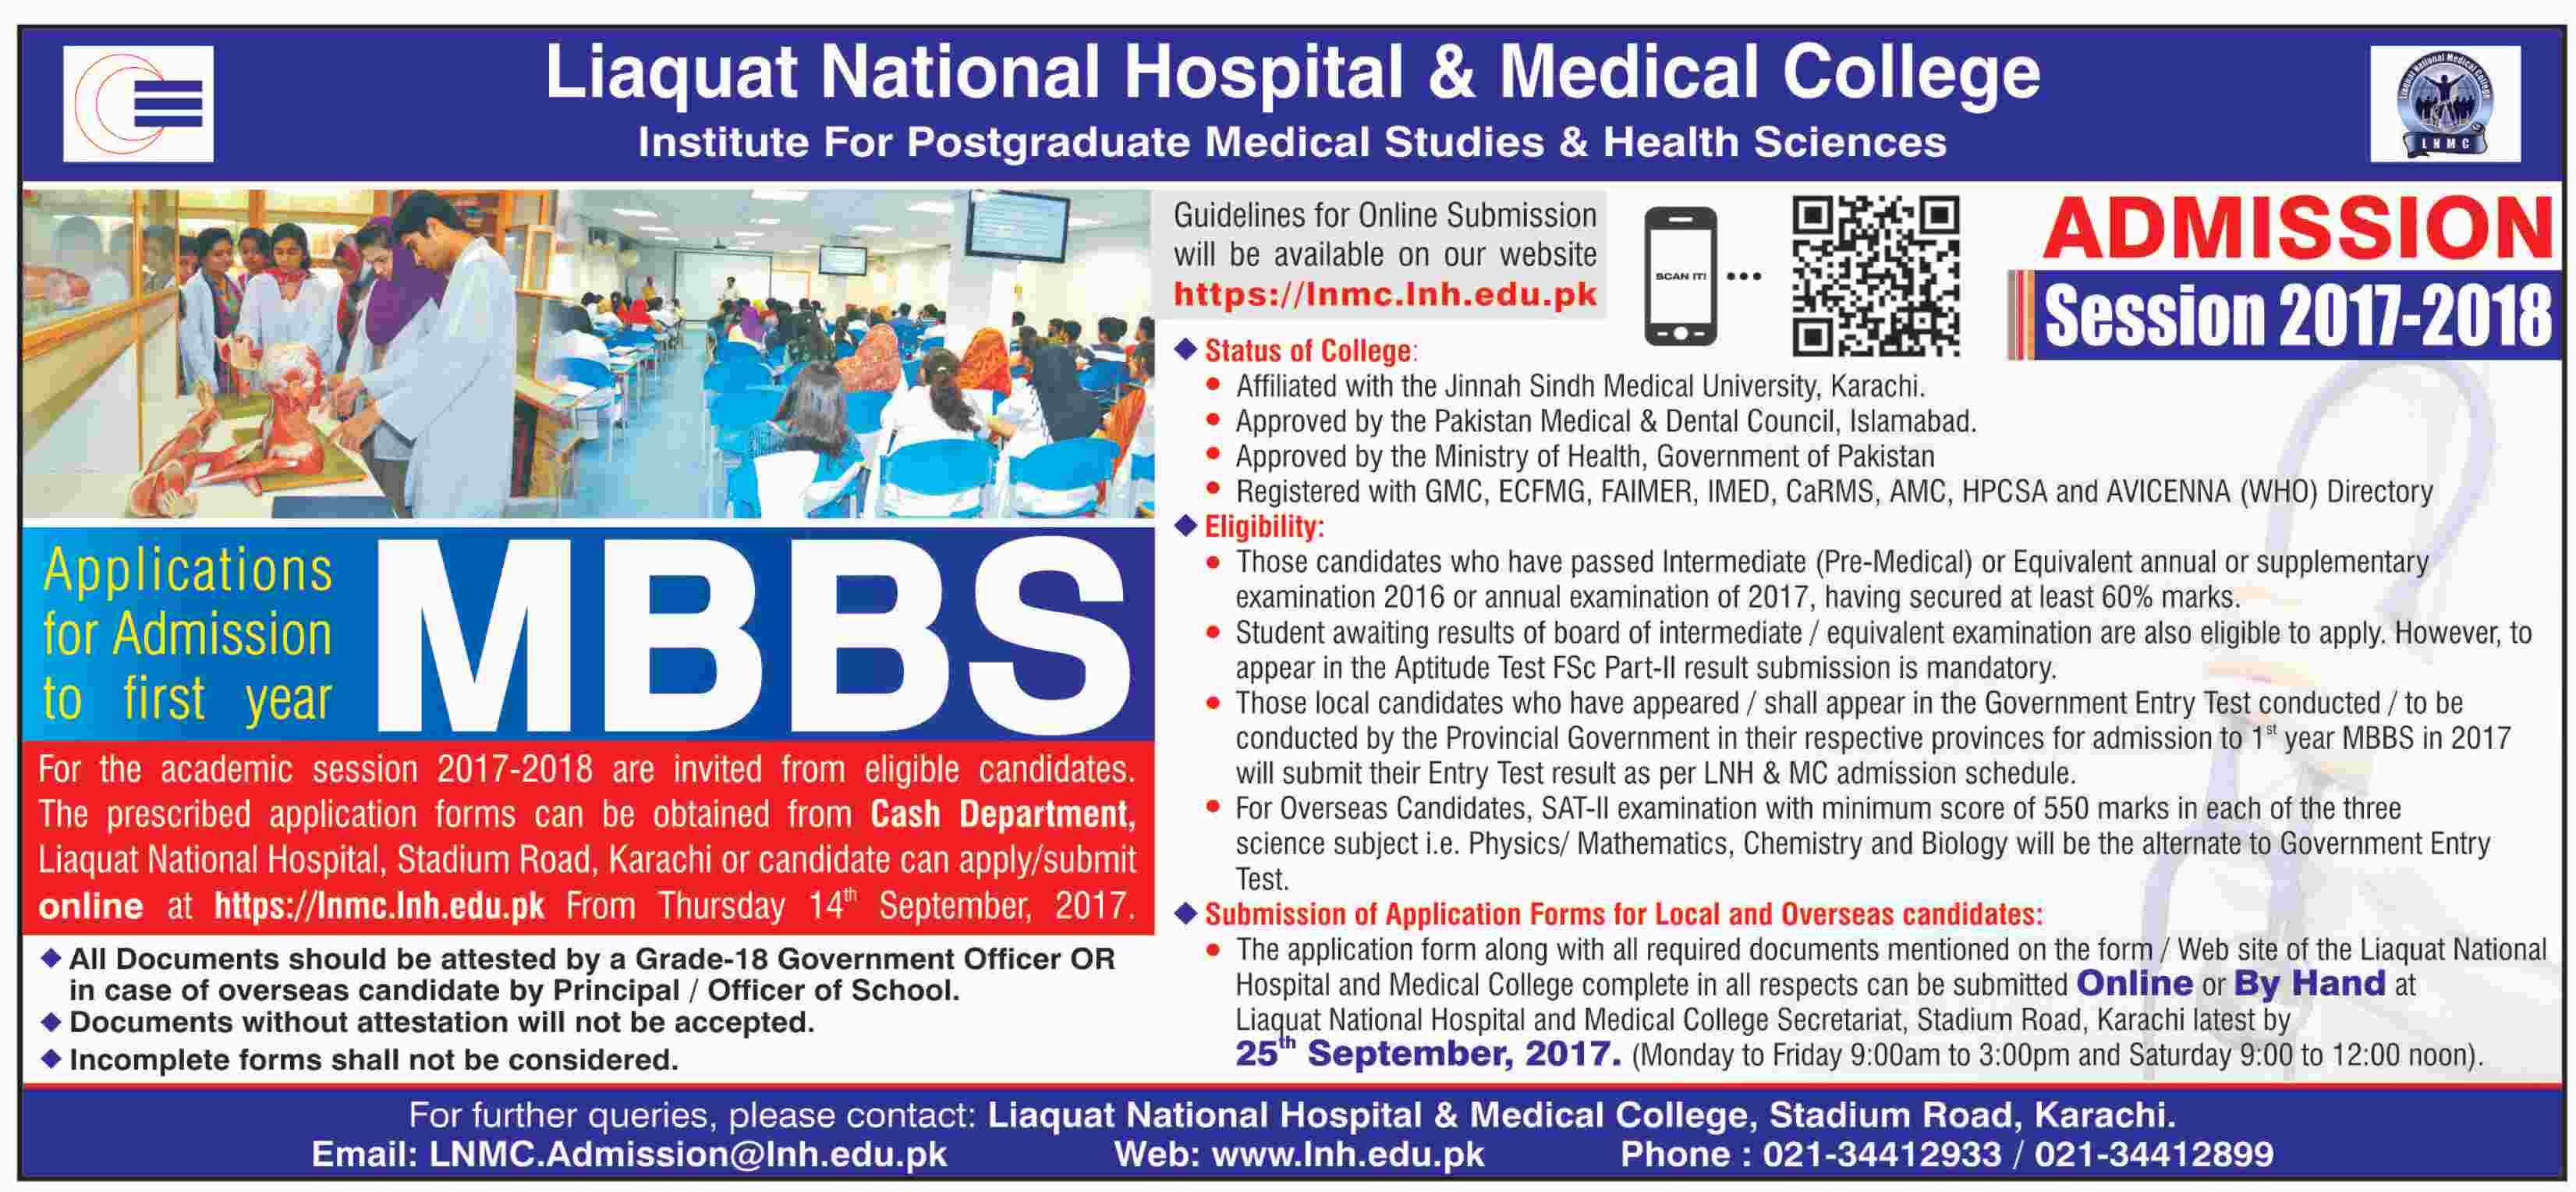 Liaquat National Medical College MBBS Admission 2017 Form, Entry Test